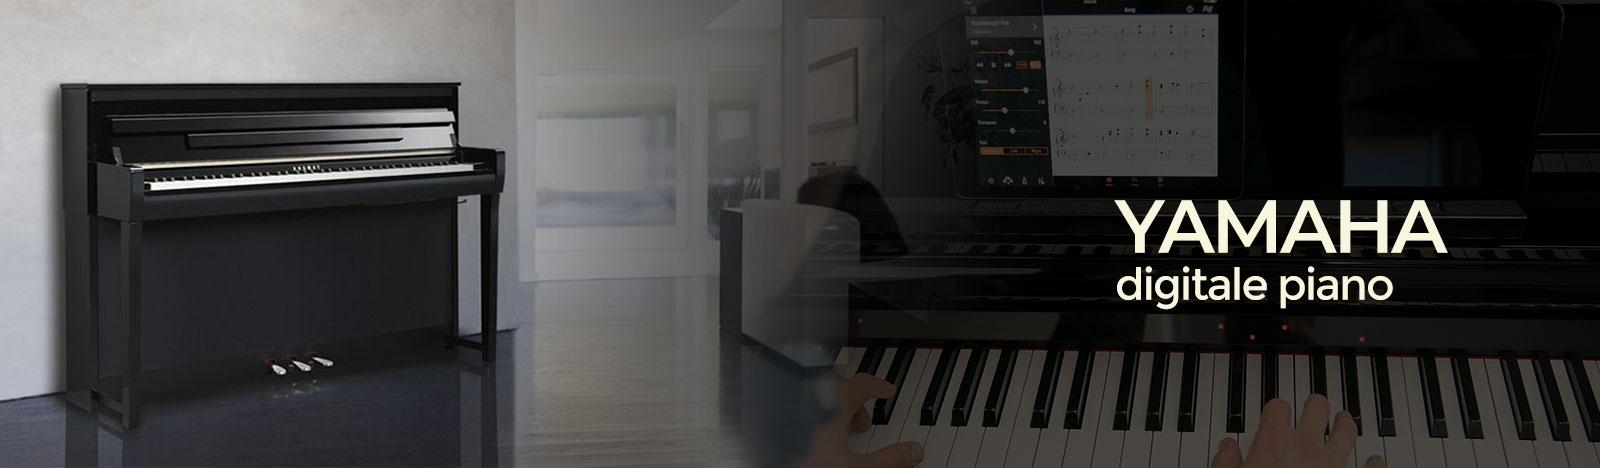 Yamaha digitale piano | Elektrische piano yamaha